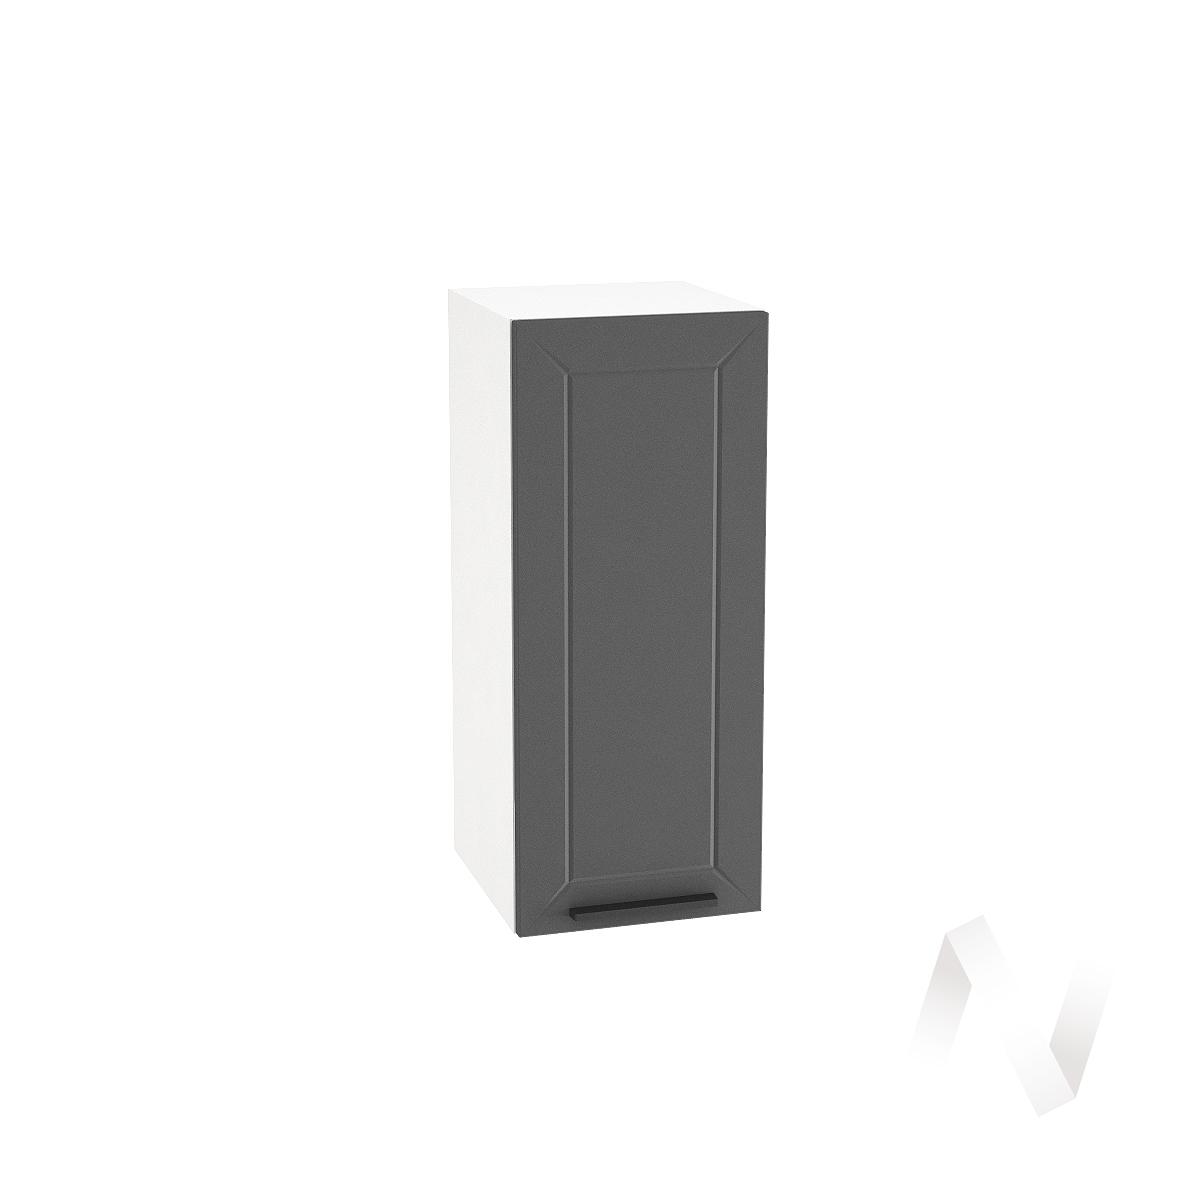 "Кухня ""Глетчер"": Шкаф верхний 300, ШВ 300 (Маренго силк/корпус белый)"